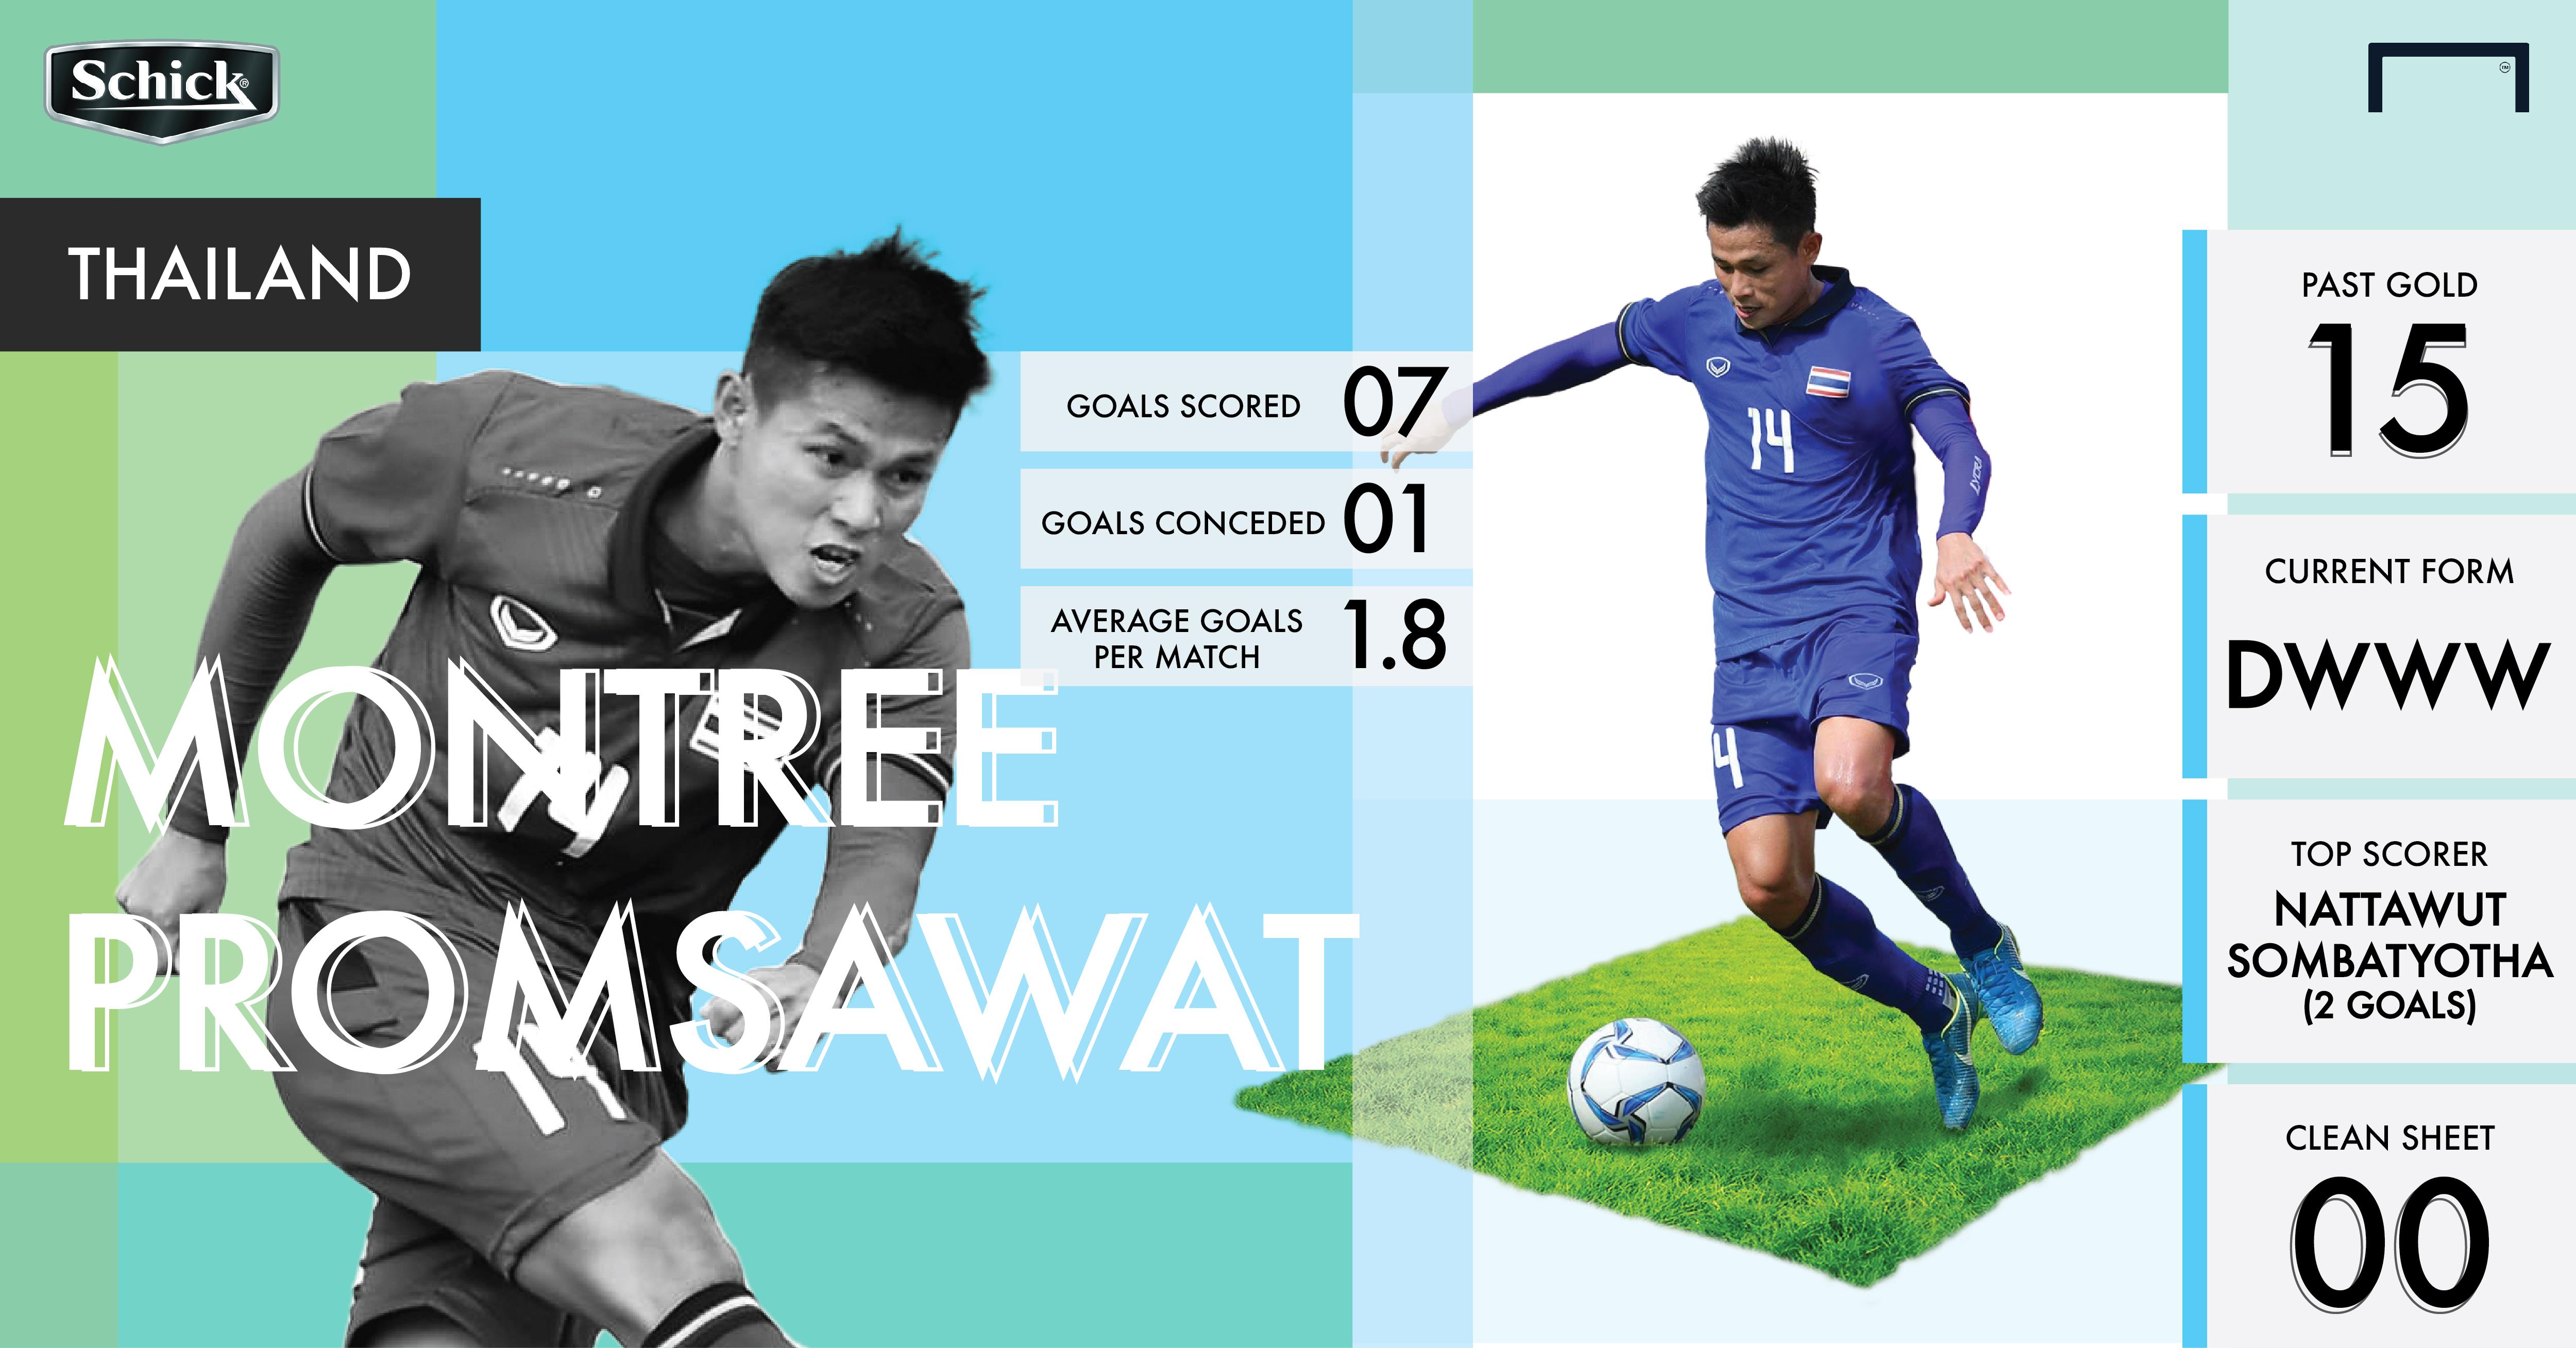 Thailand, Schick commercial, SEA Games